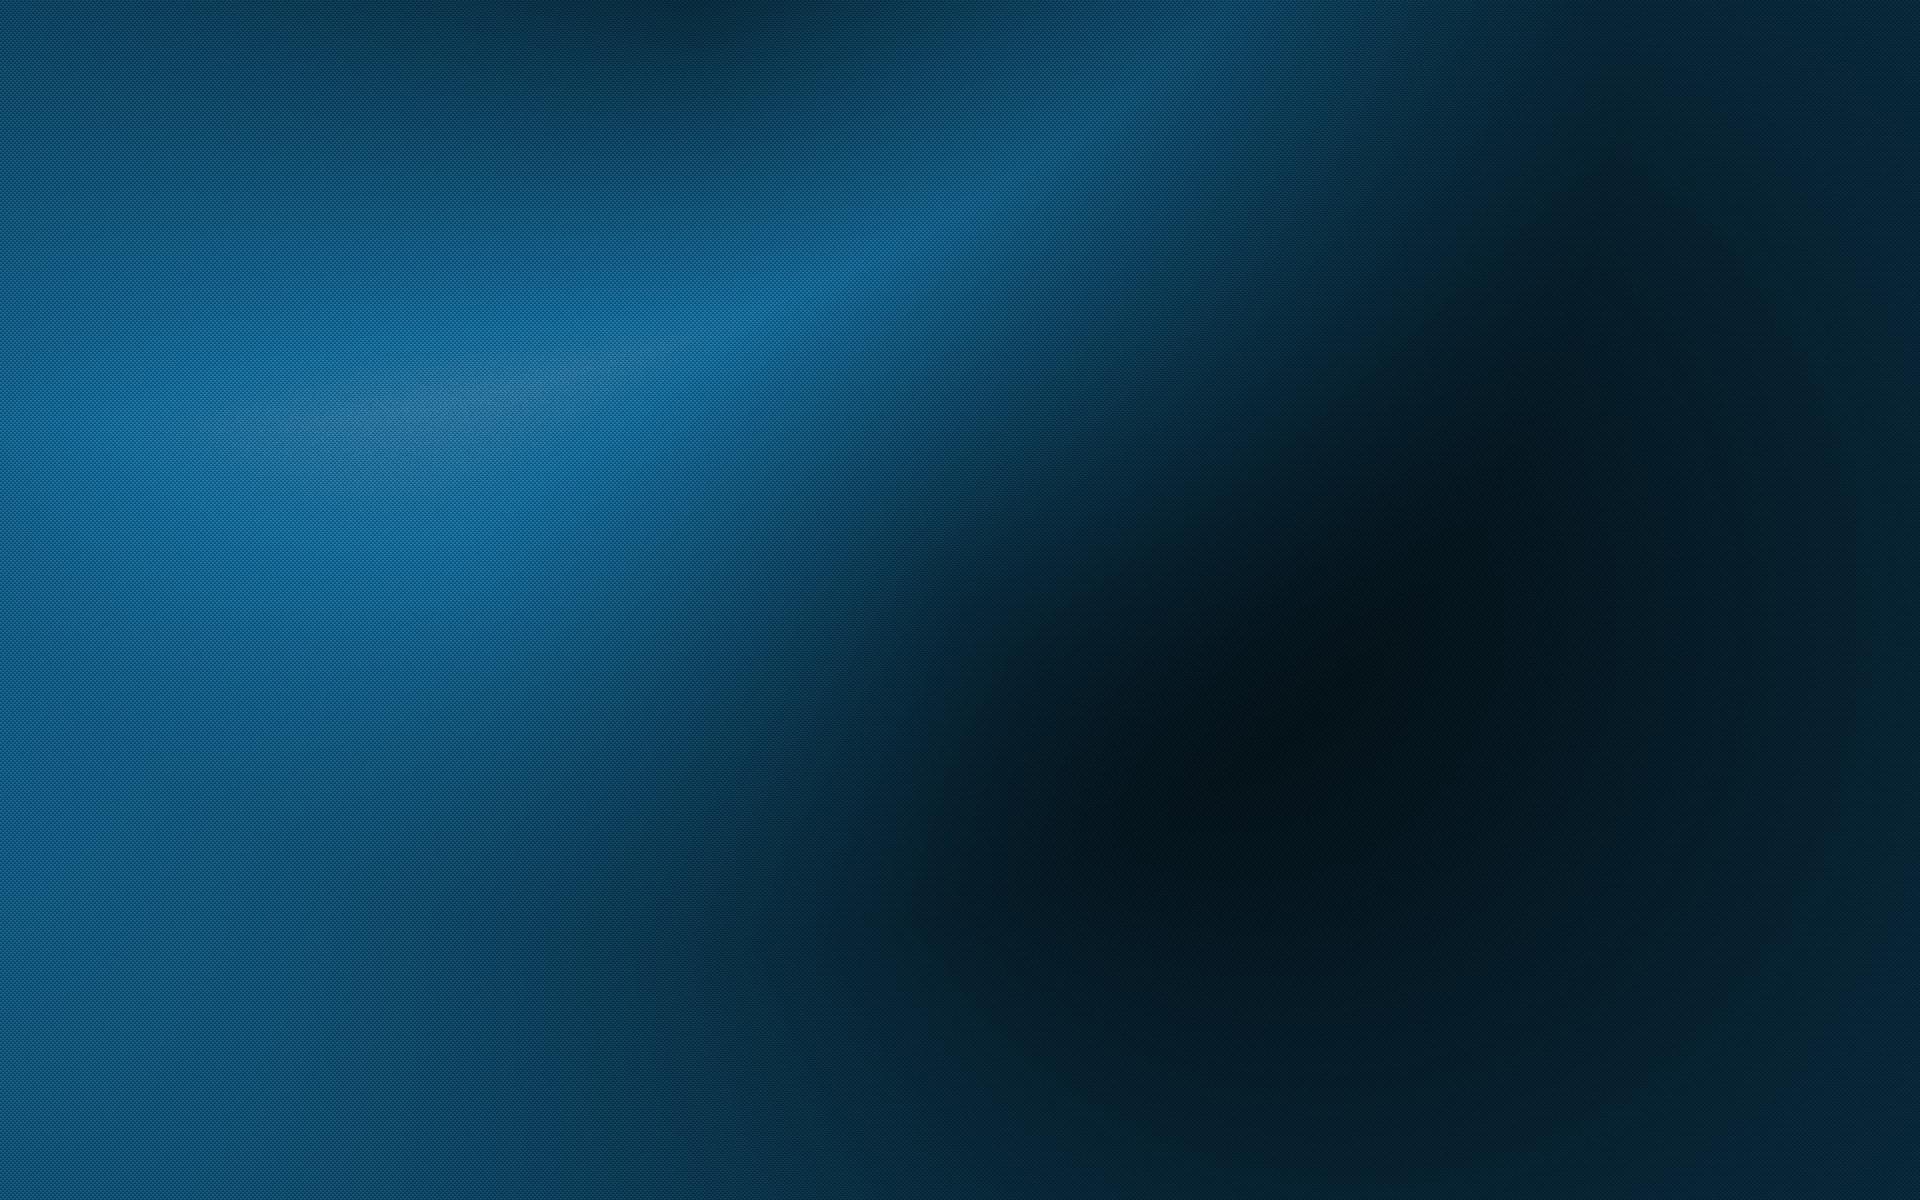 Download desktop wallpaper Beautiful dark blue abstract texture with .